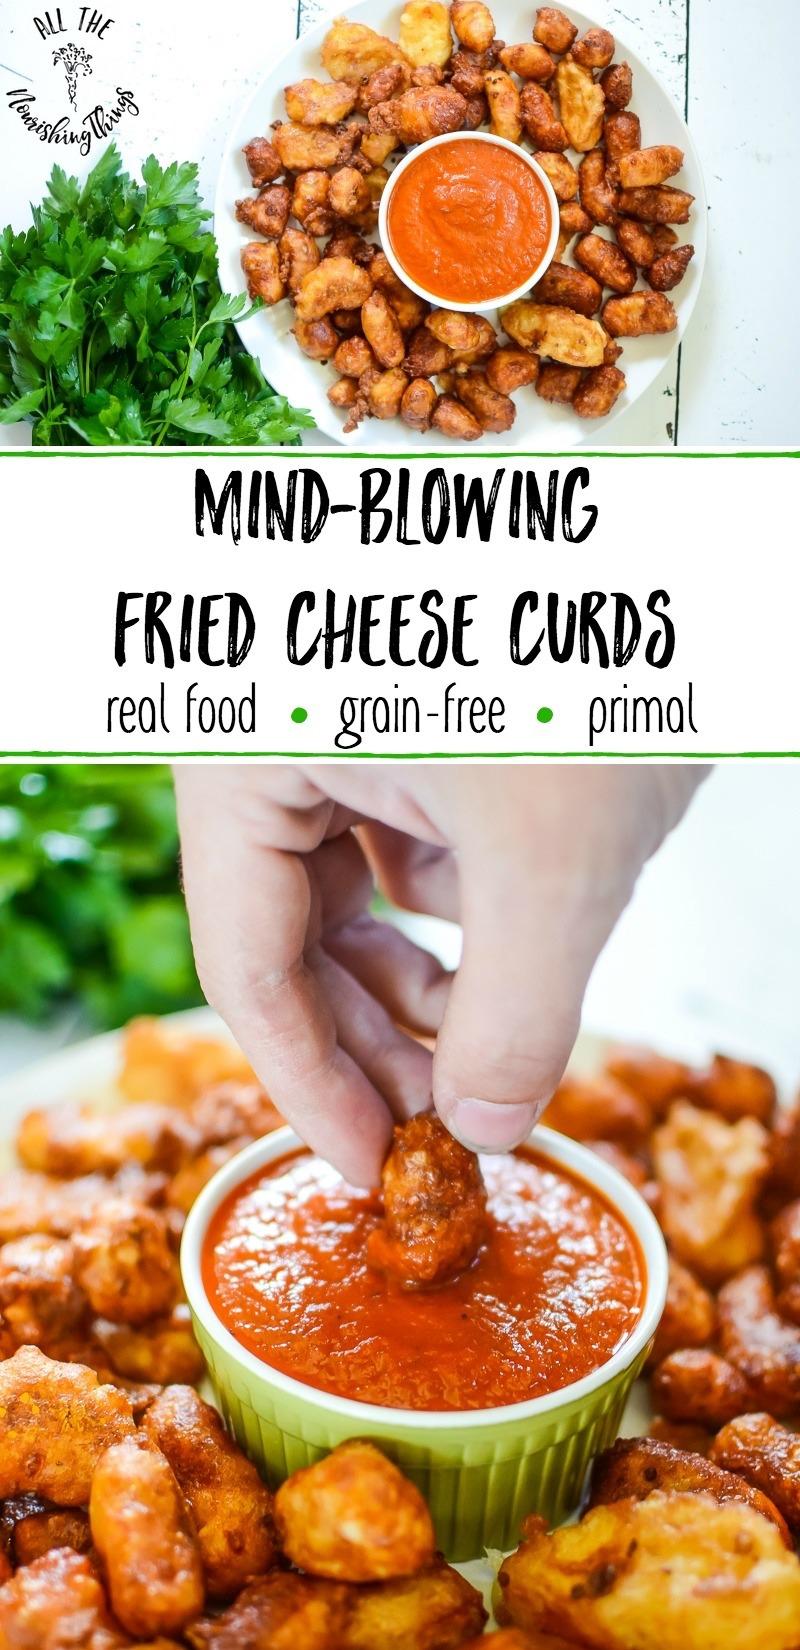 white plate of fried cheese curds with green ramekin of marinara sauce